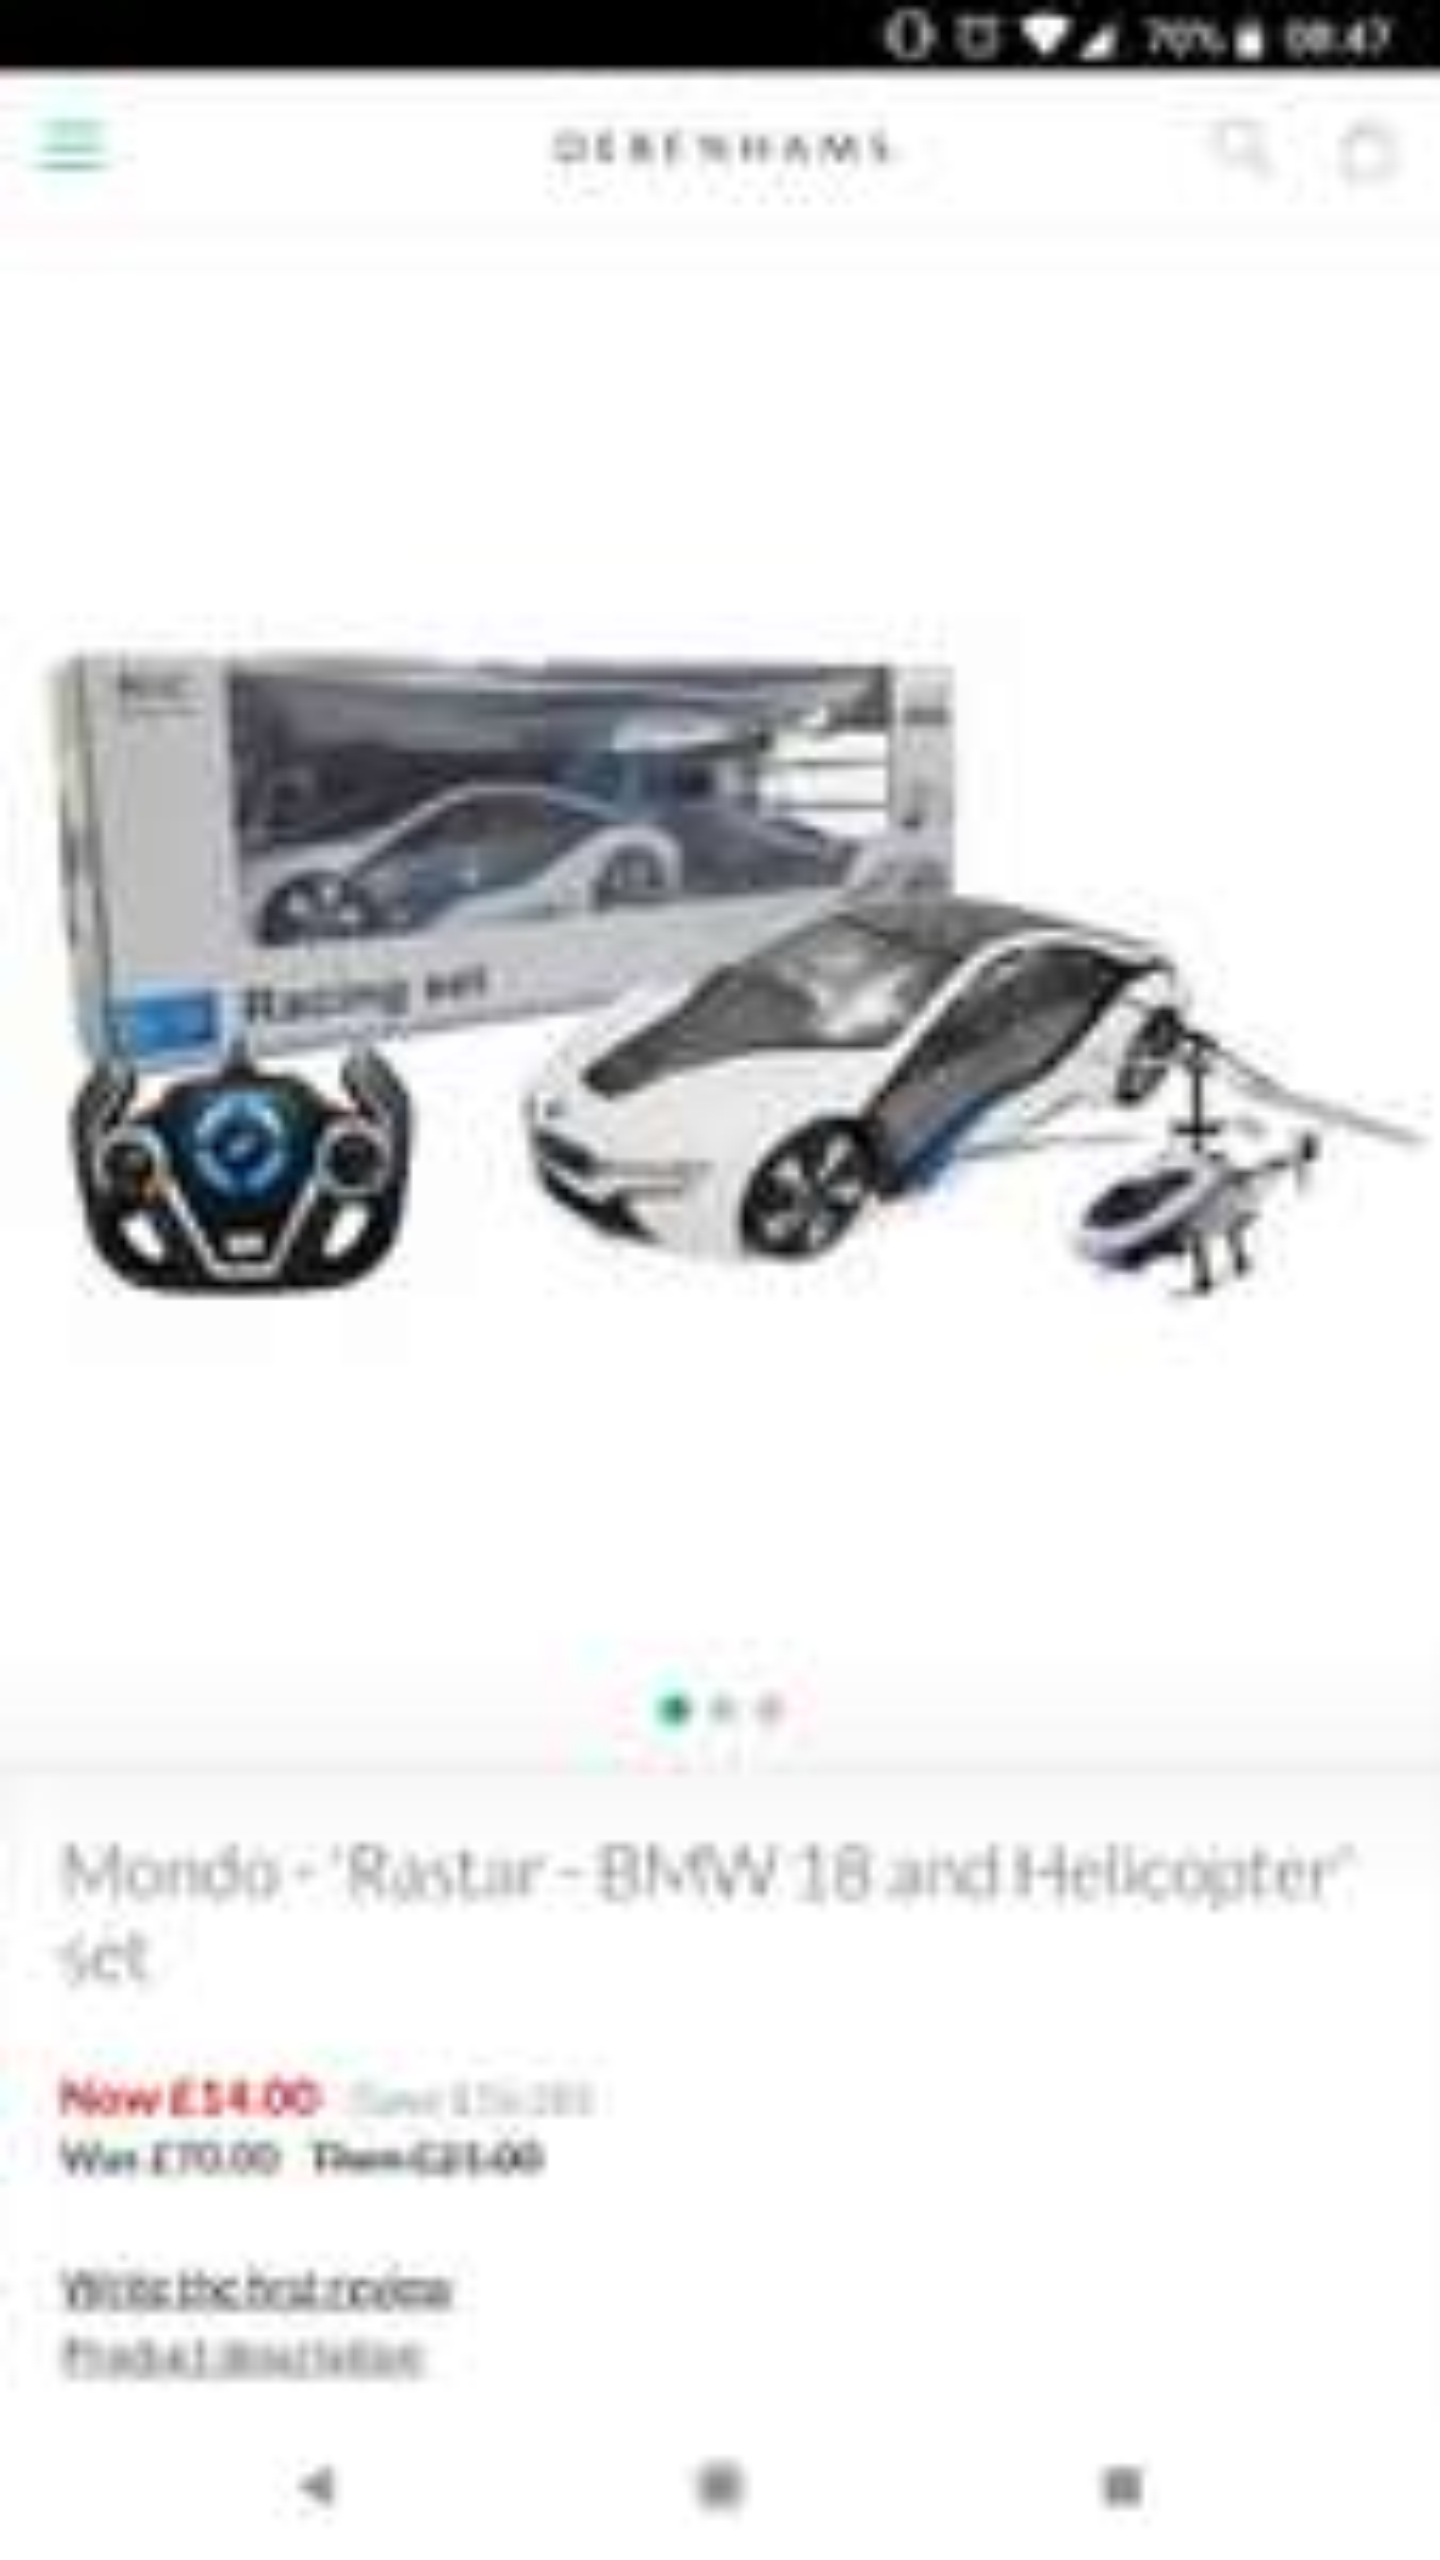 Mondo-'Rastar - BMW 18 + Helicopter' set £12.60 delivered using codes @ Debenhams